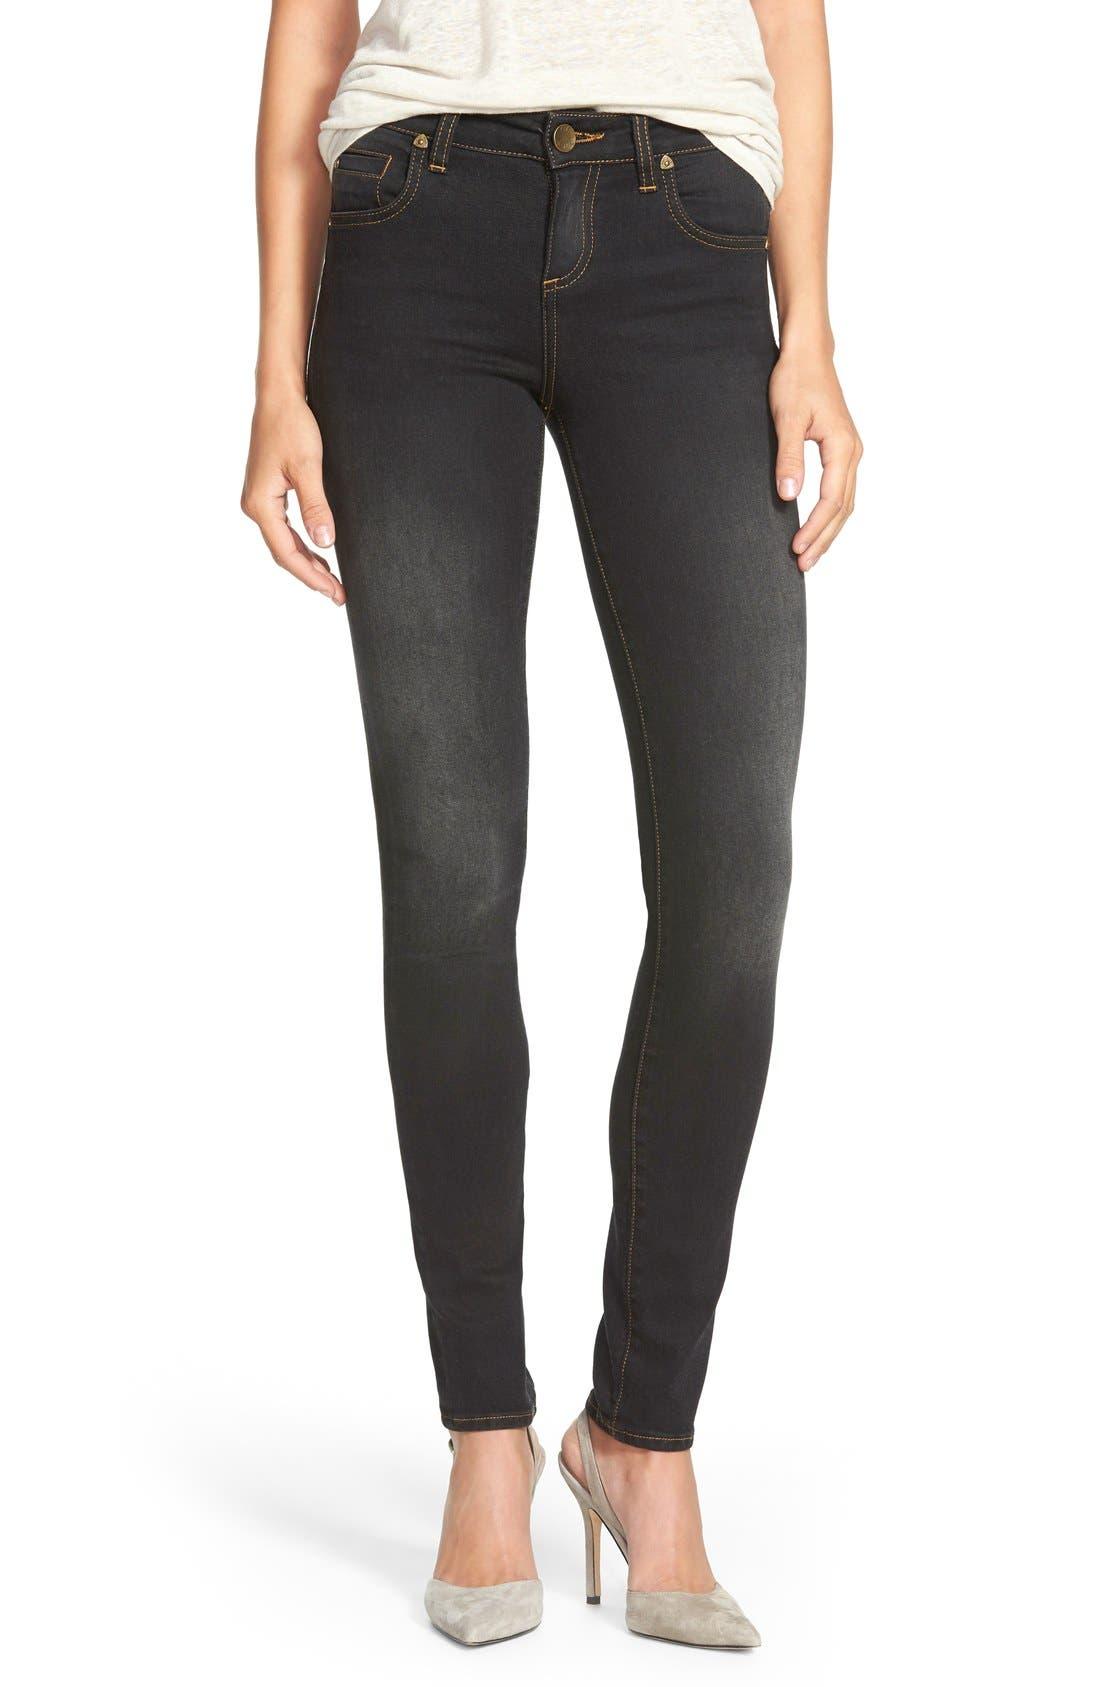 Alternate Image 1 Selected - KUT from the Kloth 'Diana' Stretch Skinny Jeans (Black) (Regular & Petite)